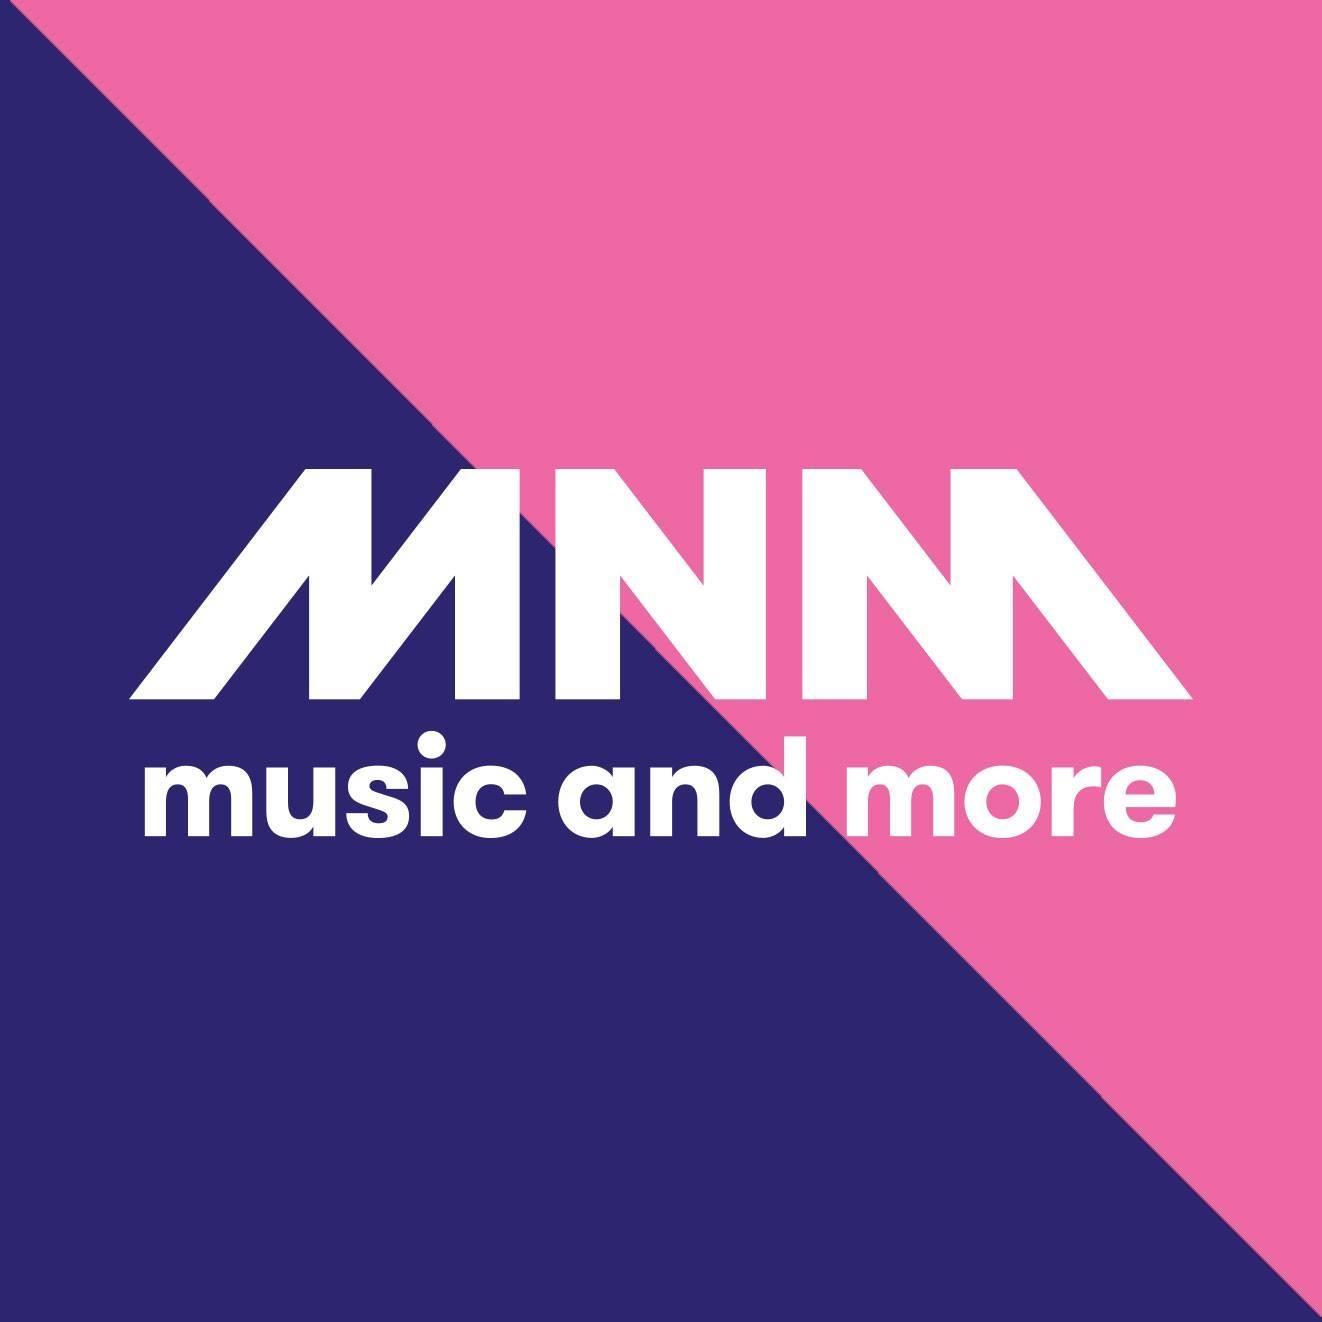 Радио VRT MNM Hits Бельгия, Брюссель